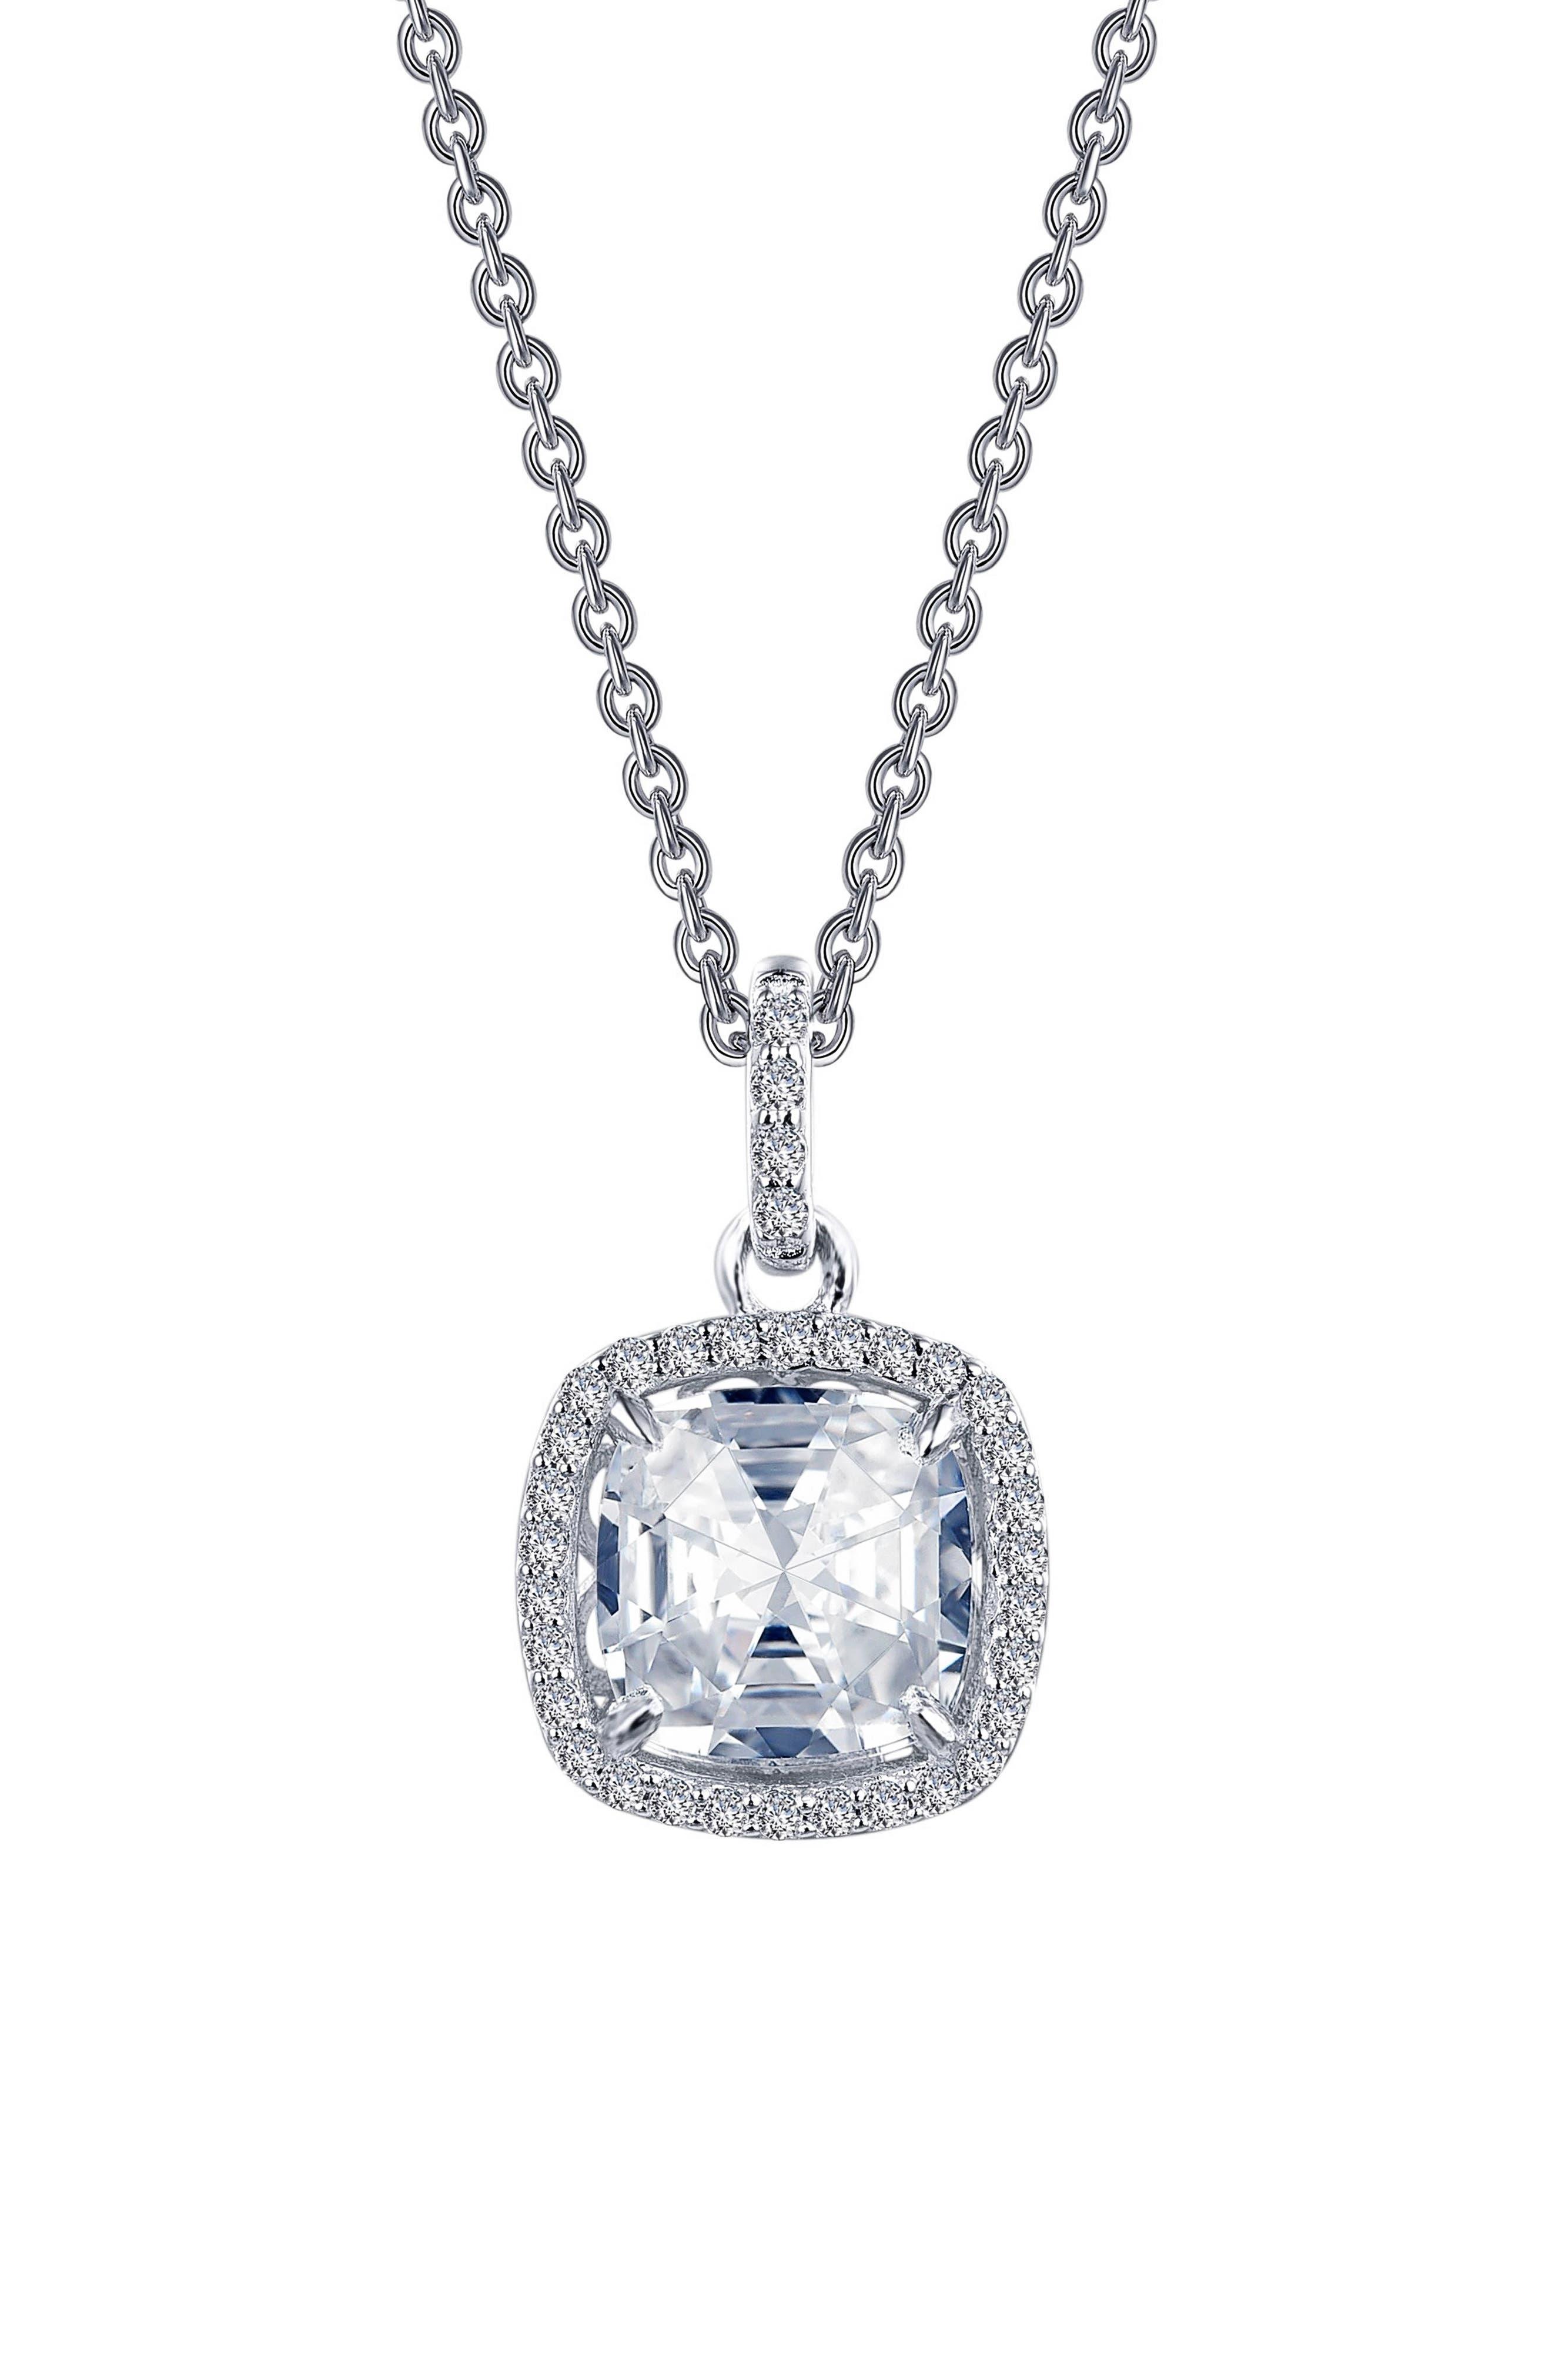 Rose Cut Simulated Diamond Necklace,                             Main thumbnail 1, color,                             040